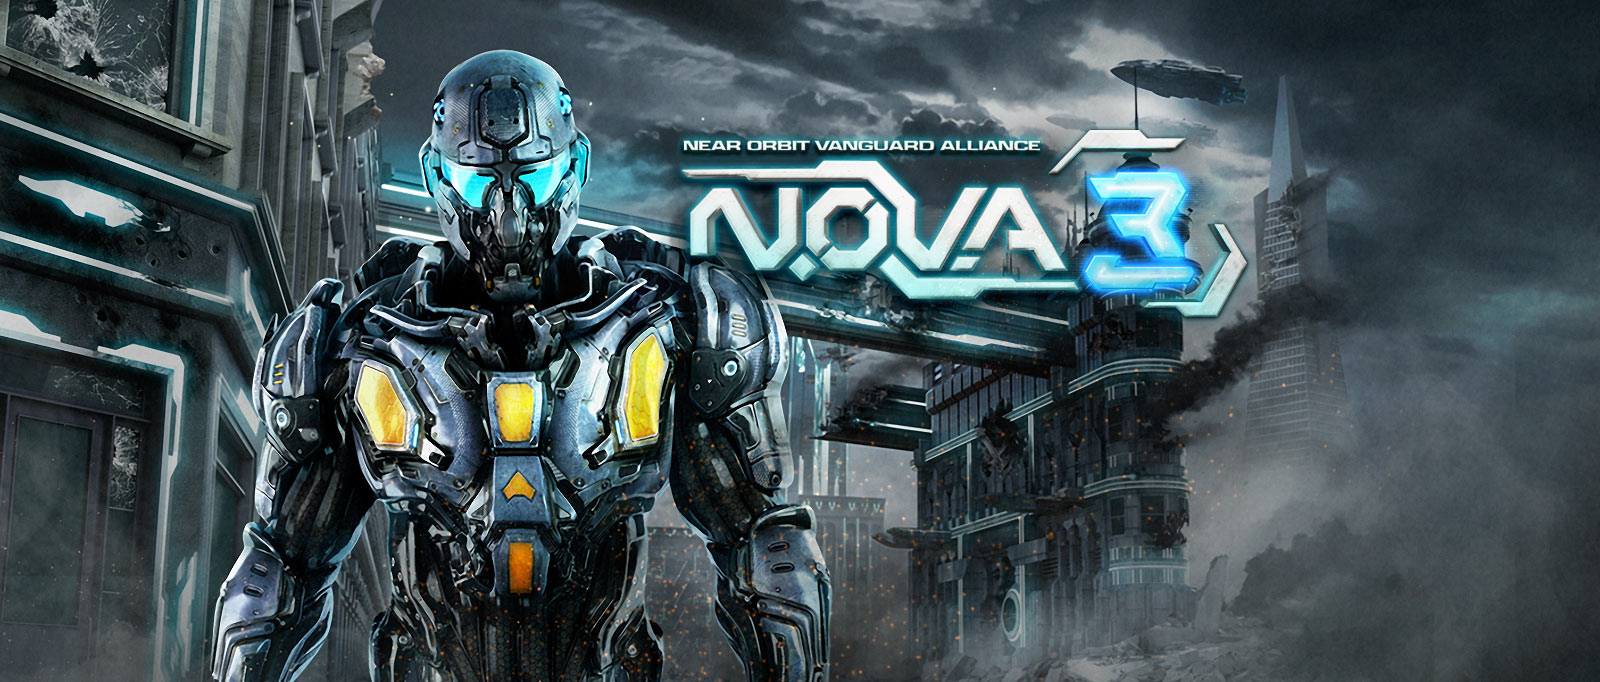 N.O.V.A. 3 - 近軌道先鋒聯盟